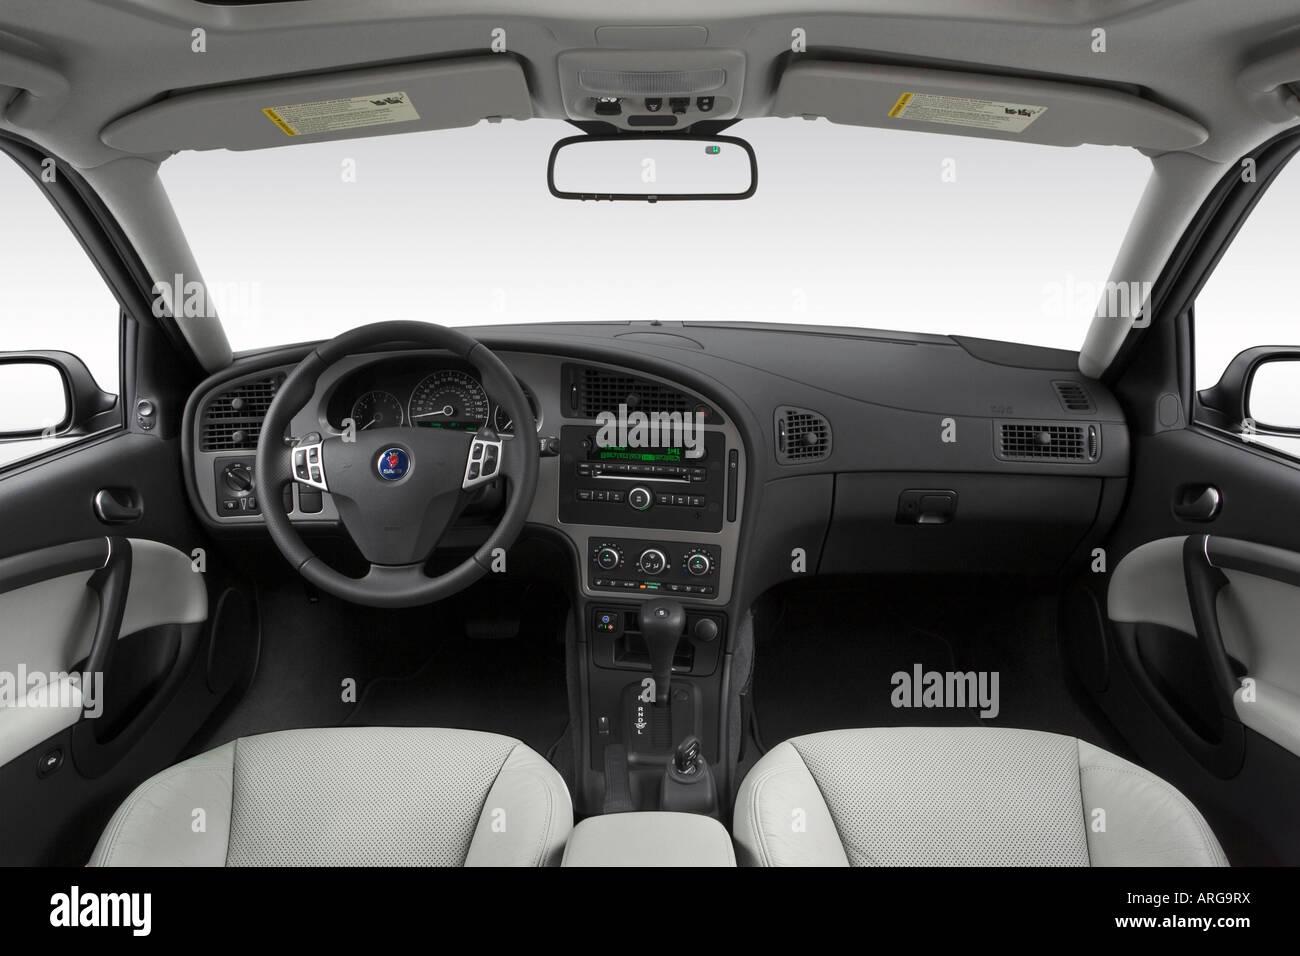 2007 Saab 9 5 23T SportCombi In Black